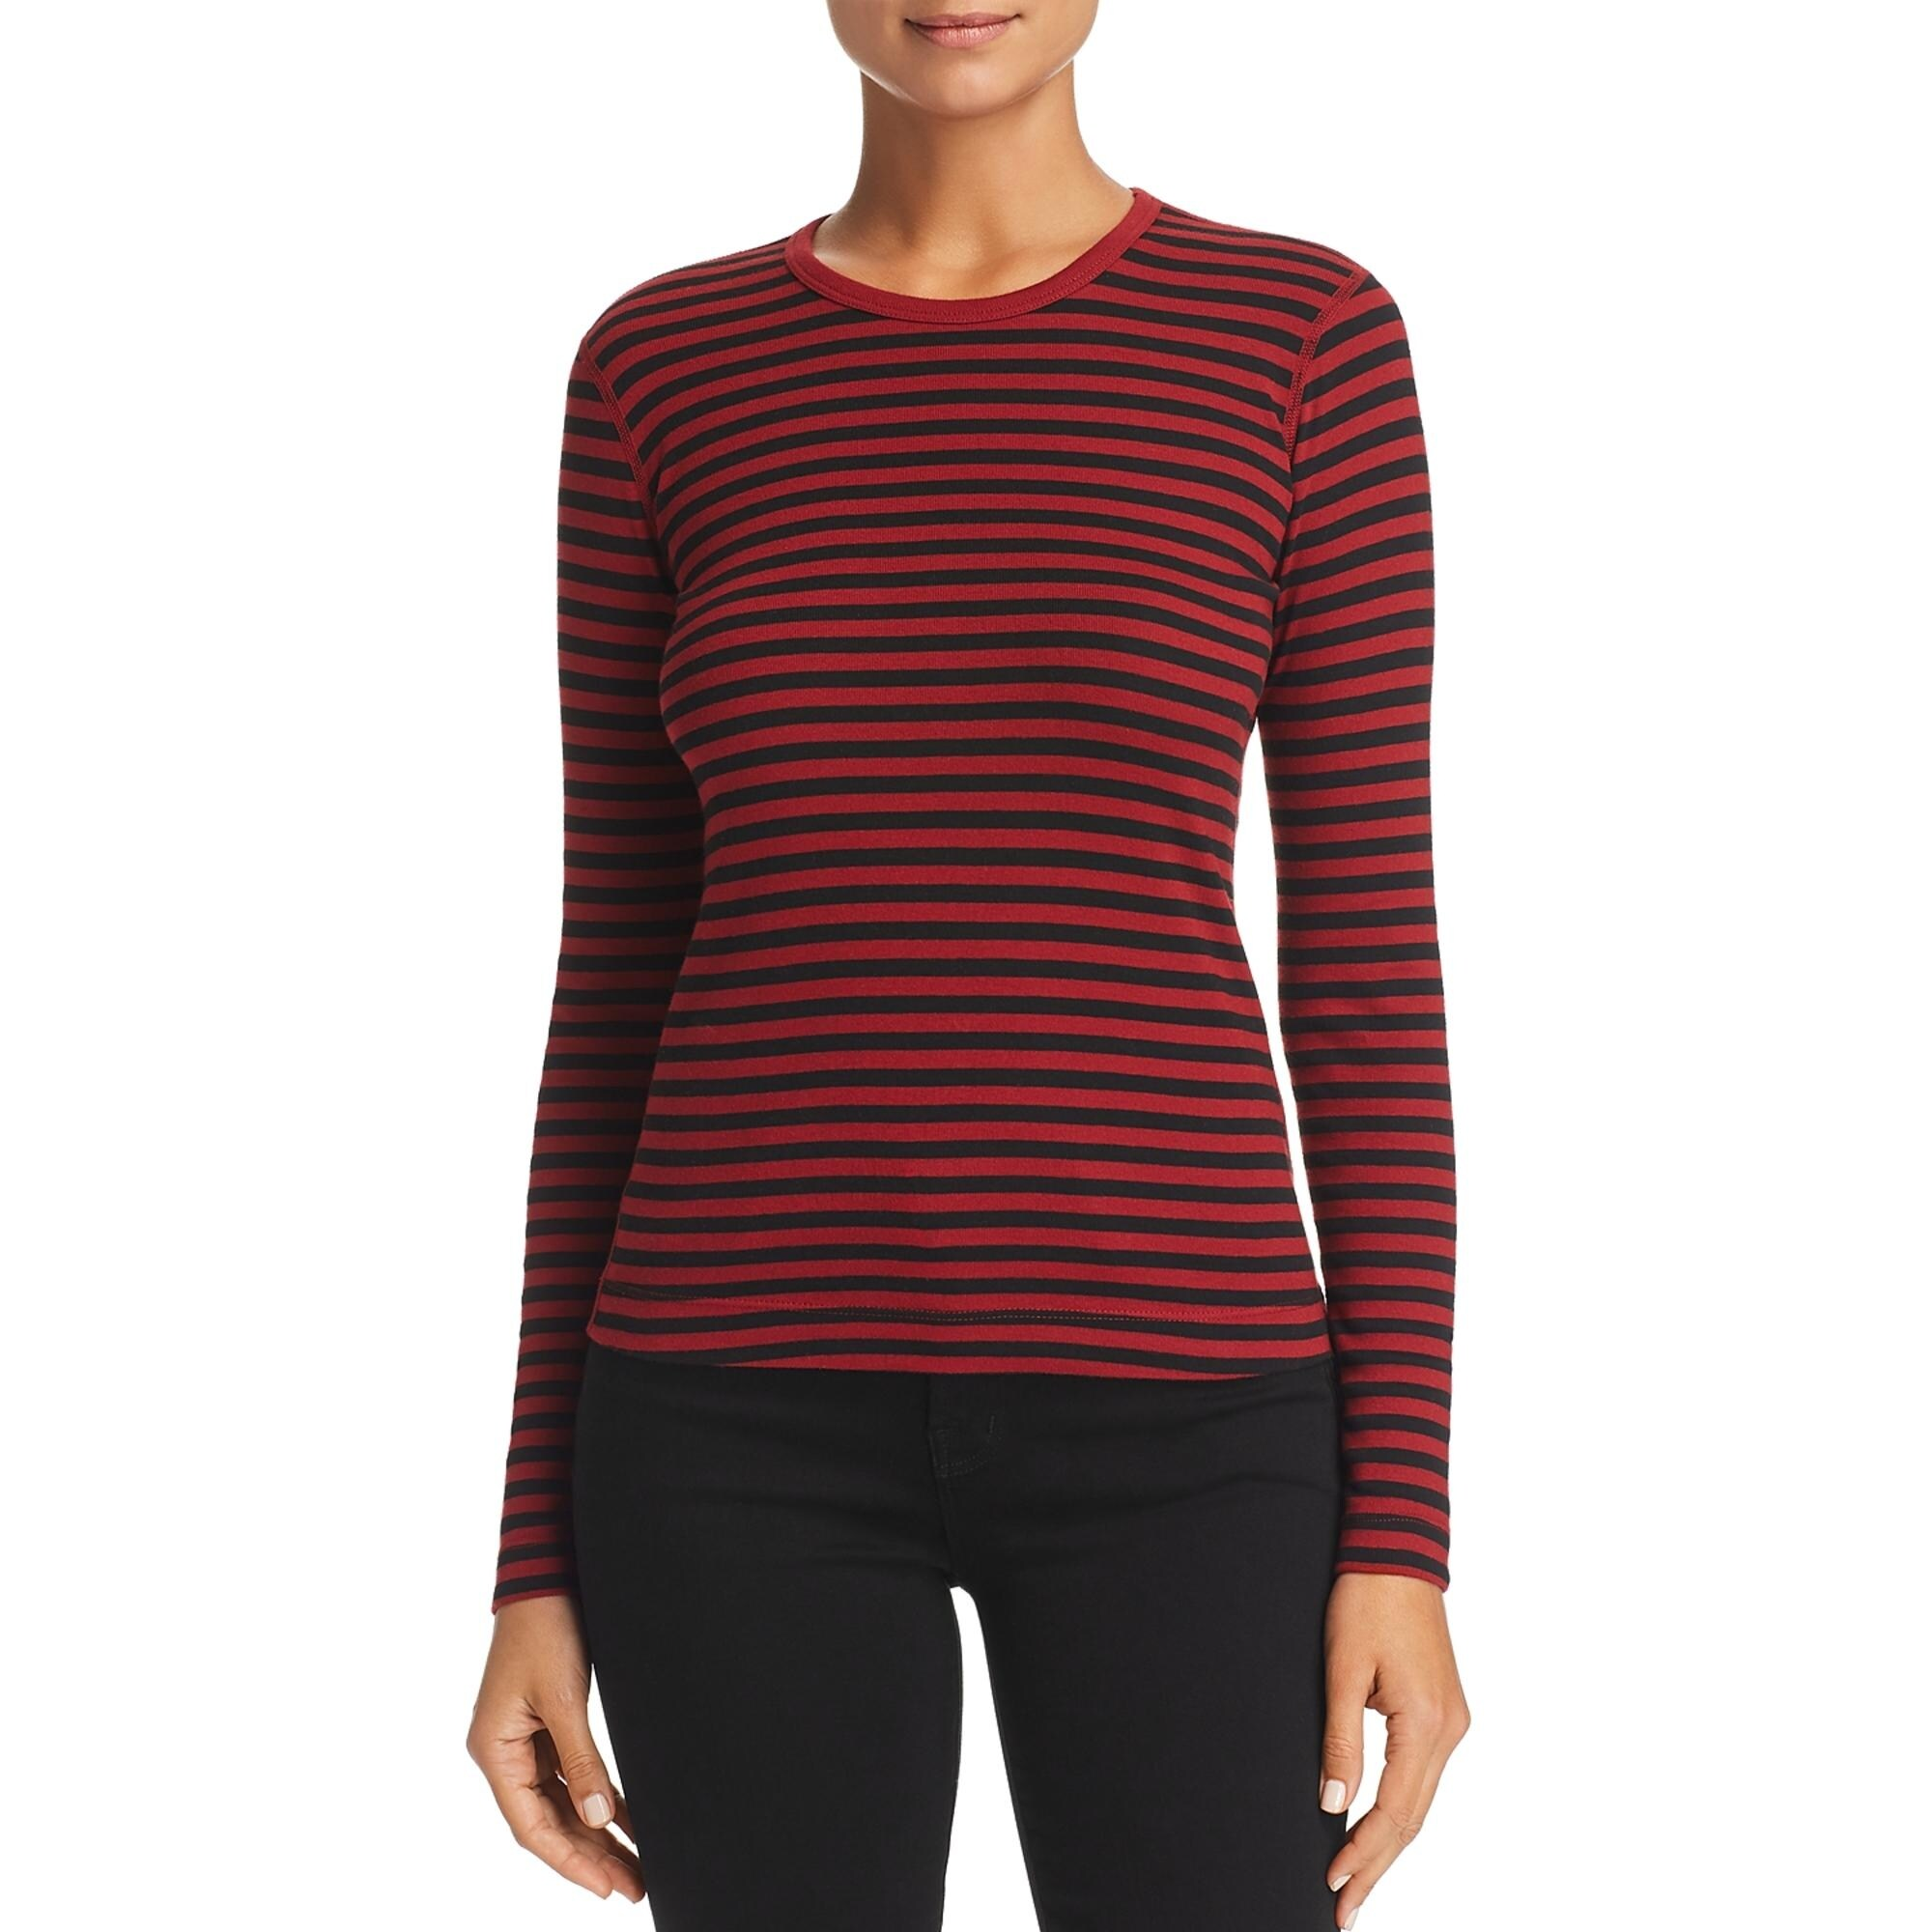 Three Dots Womens Mykonos Striped Crew Neck 3//4 Sleeves T-Shirt Top BHFO 9671